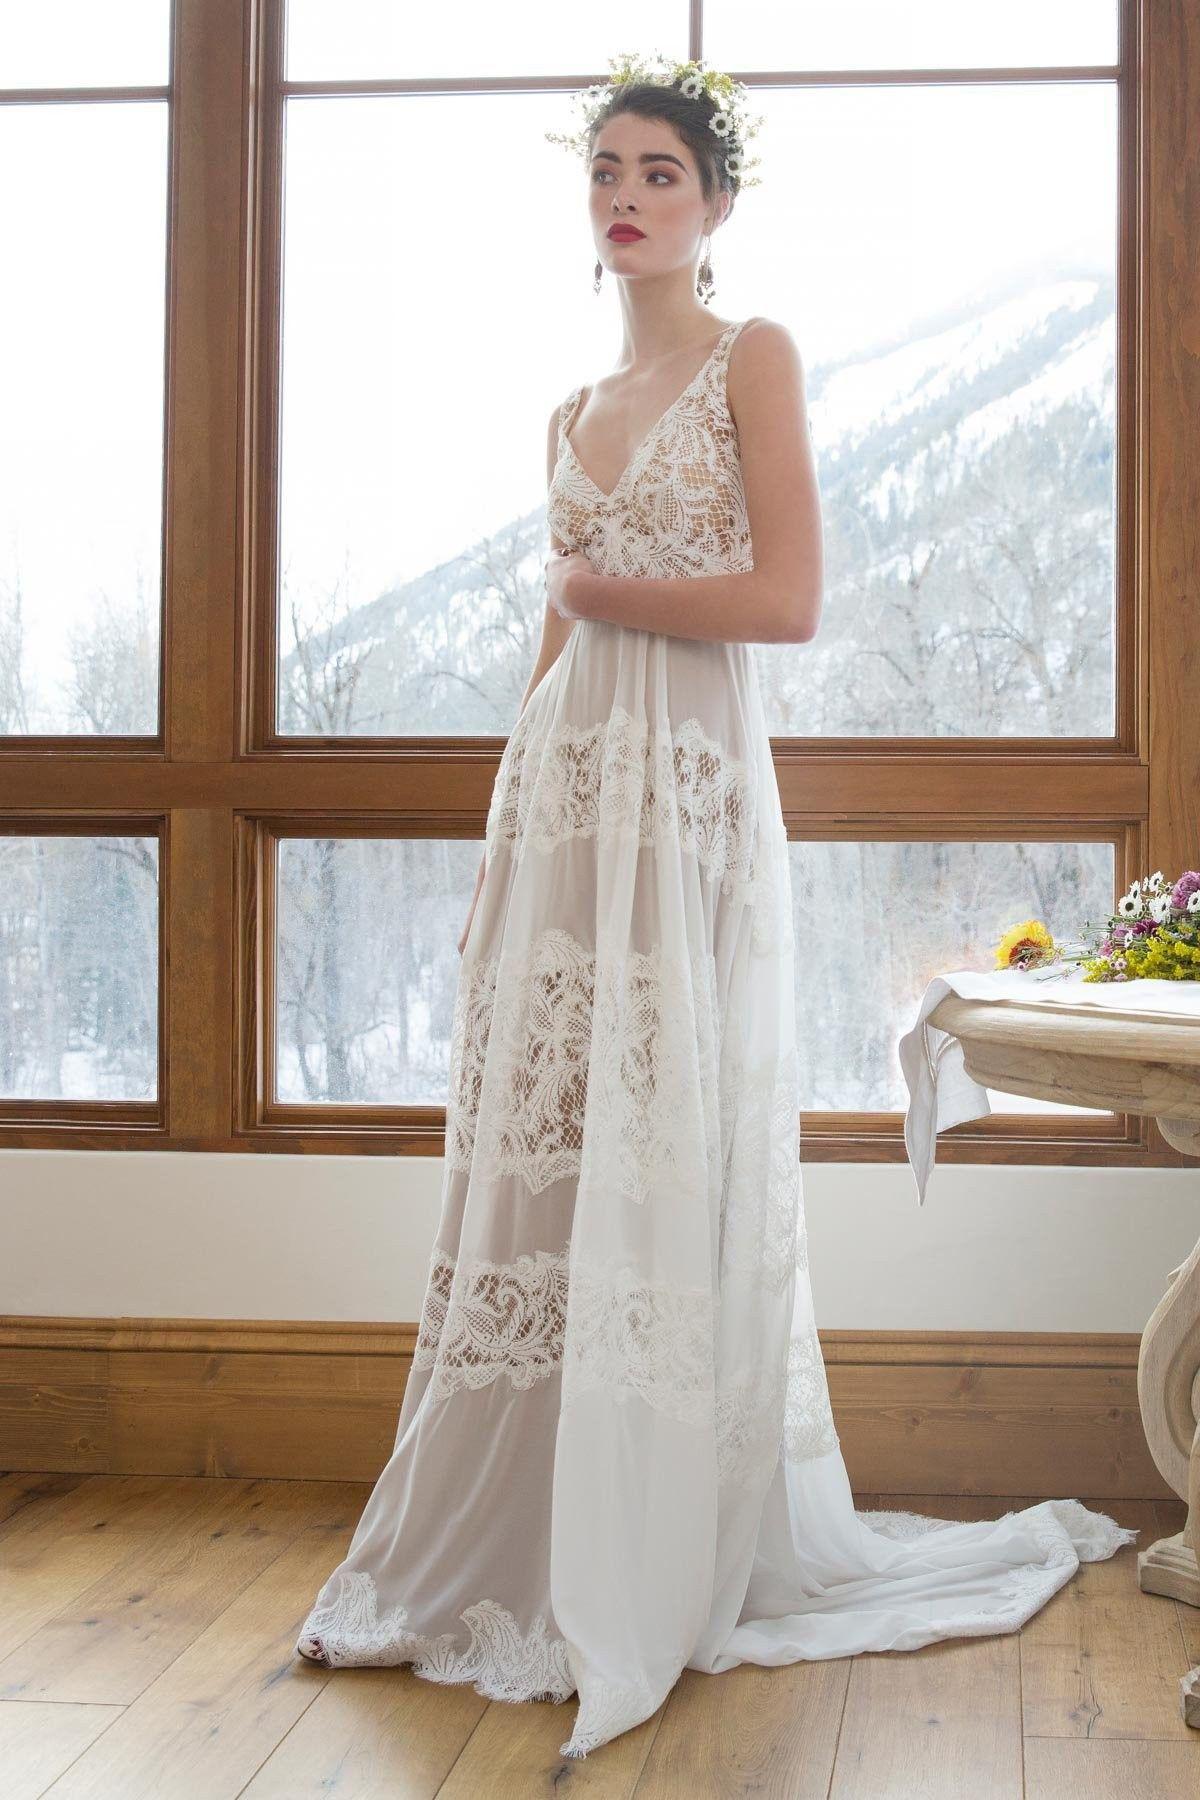 Willowby Designer Boho Bridal Dress Full Length Lace Dress With V